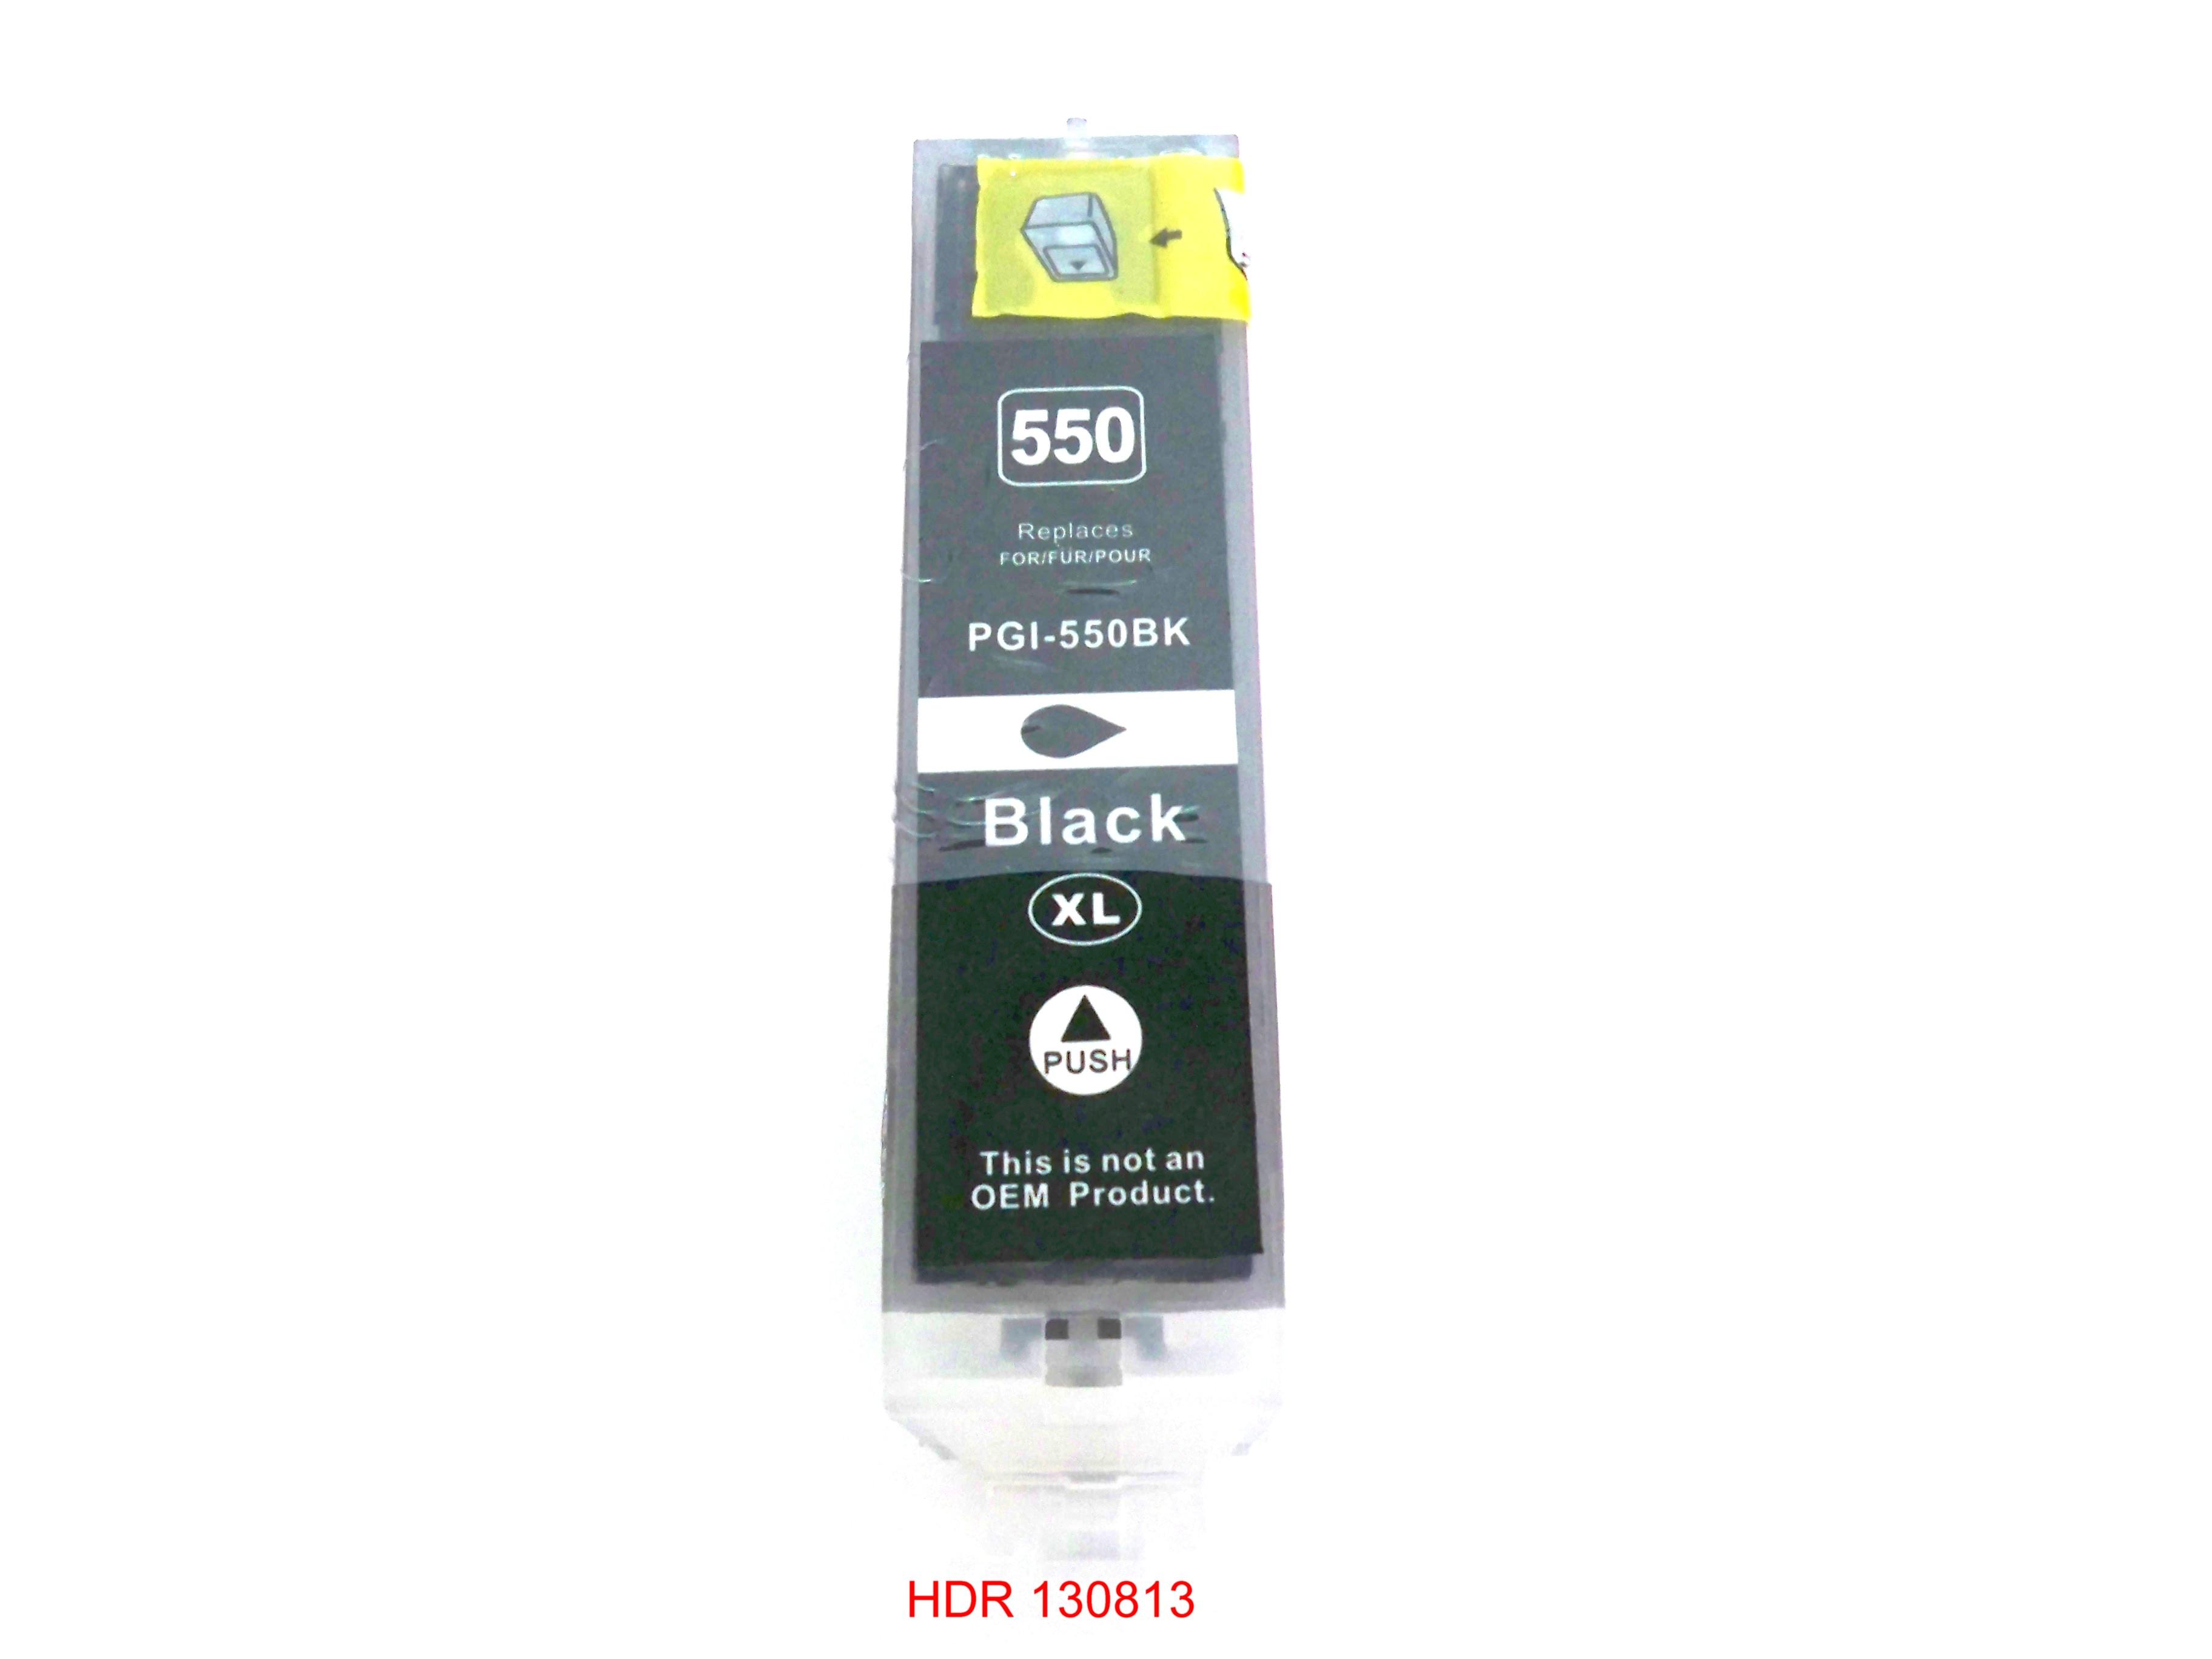 kompatible tintenpatrone black breit f r canon pixma mg 5650 mg 5655 mg 6650 mg 7150 mg. Black Bedroom Furniture Sets. Home Design Ideas